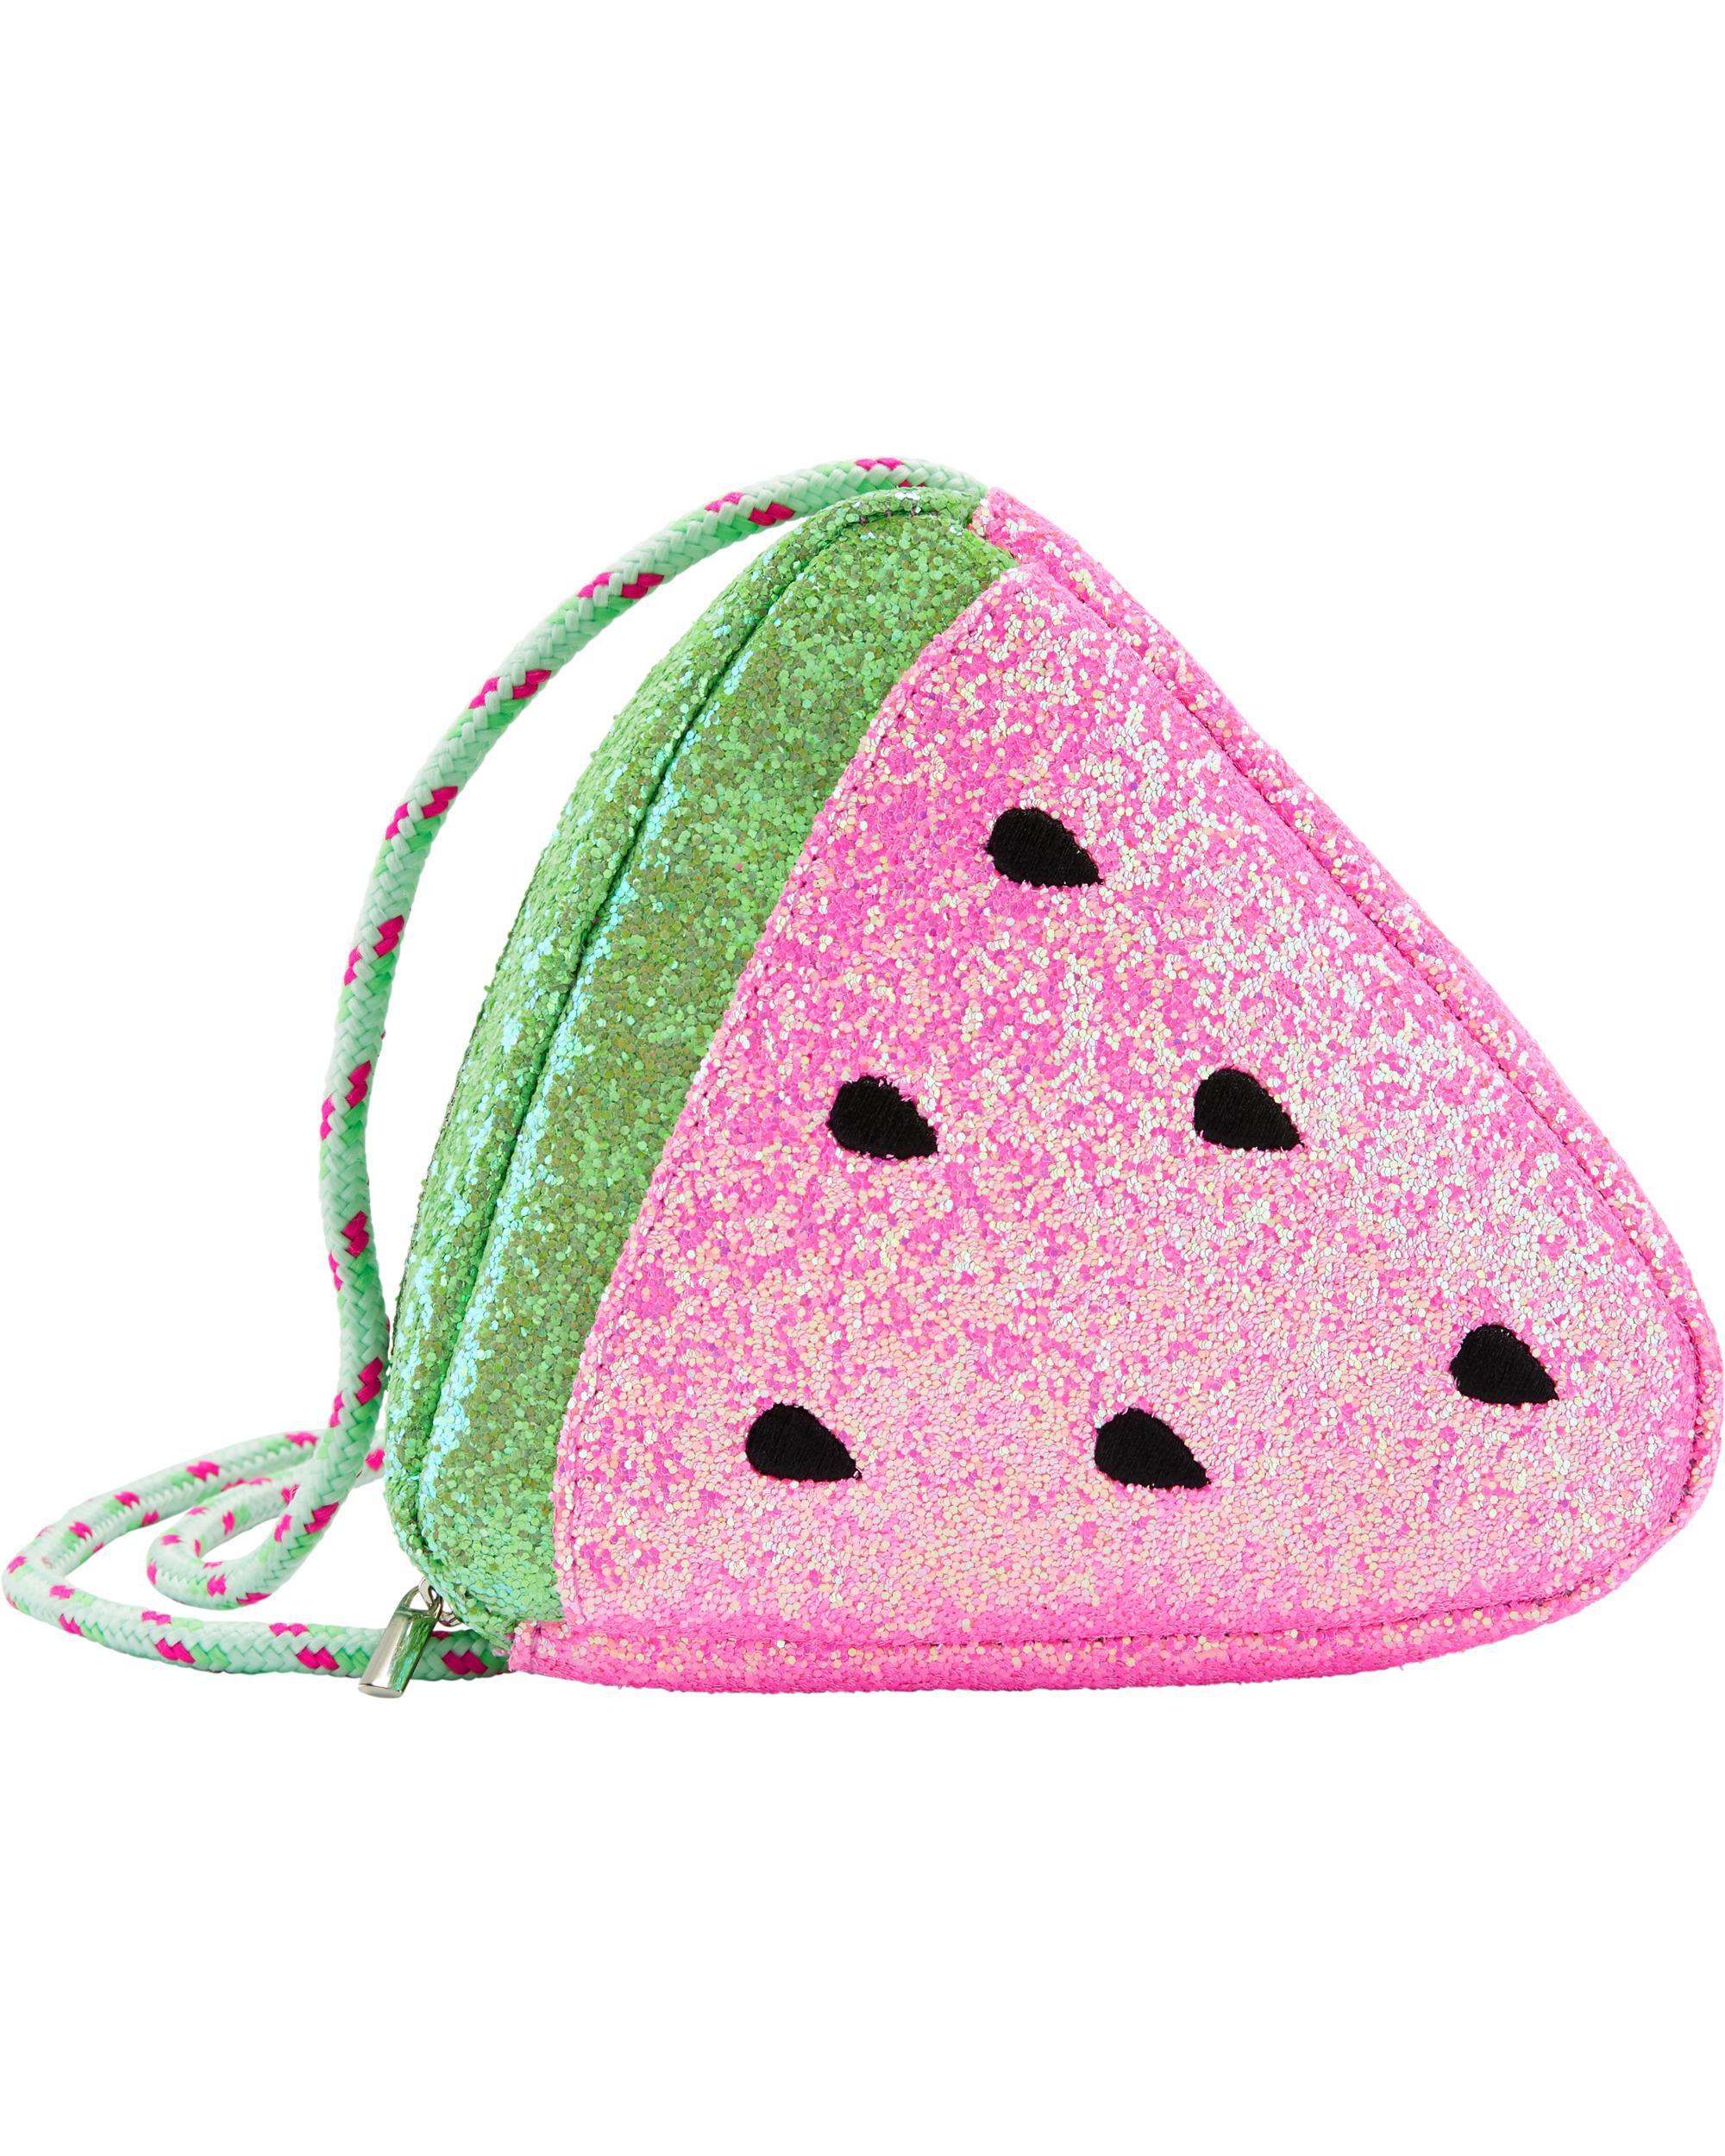 Images. Watermelon Purse ab34bf6c0554